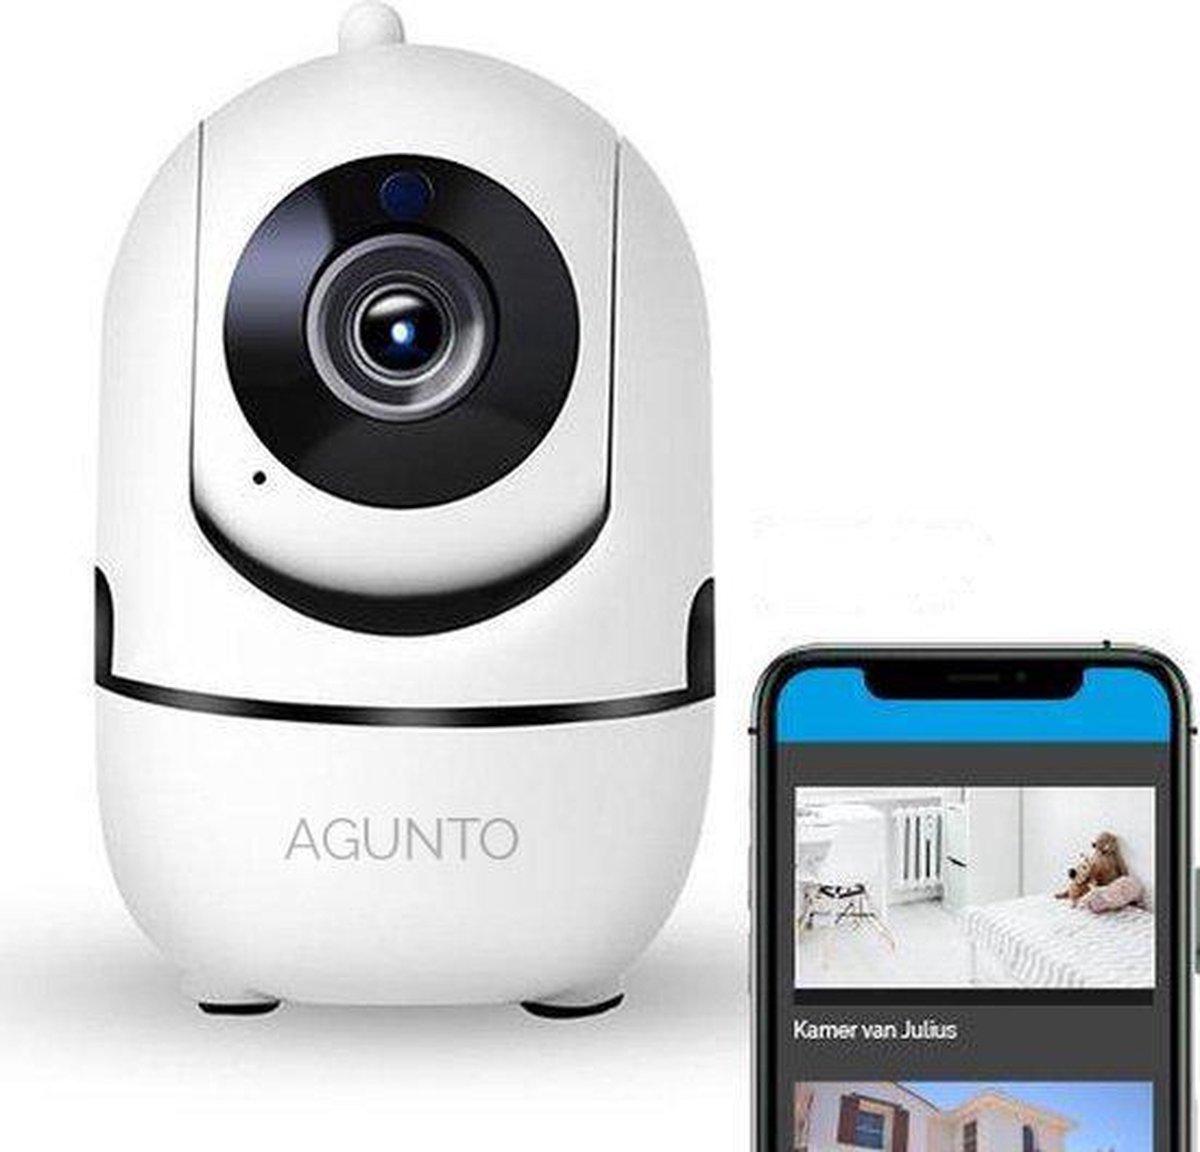 Agunto Babyfoon - Beveiligingscamera - Babyfoon met camera - WiFi - Beveiligd - HD Quality + Telefoo